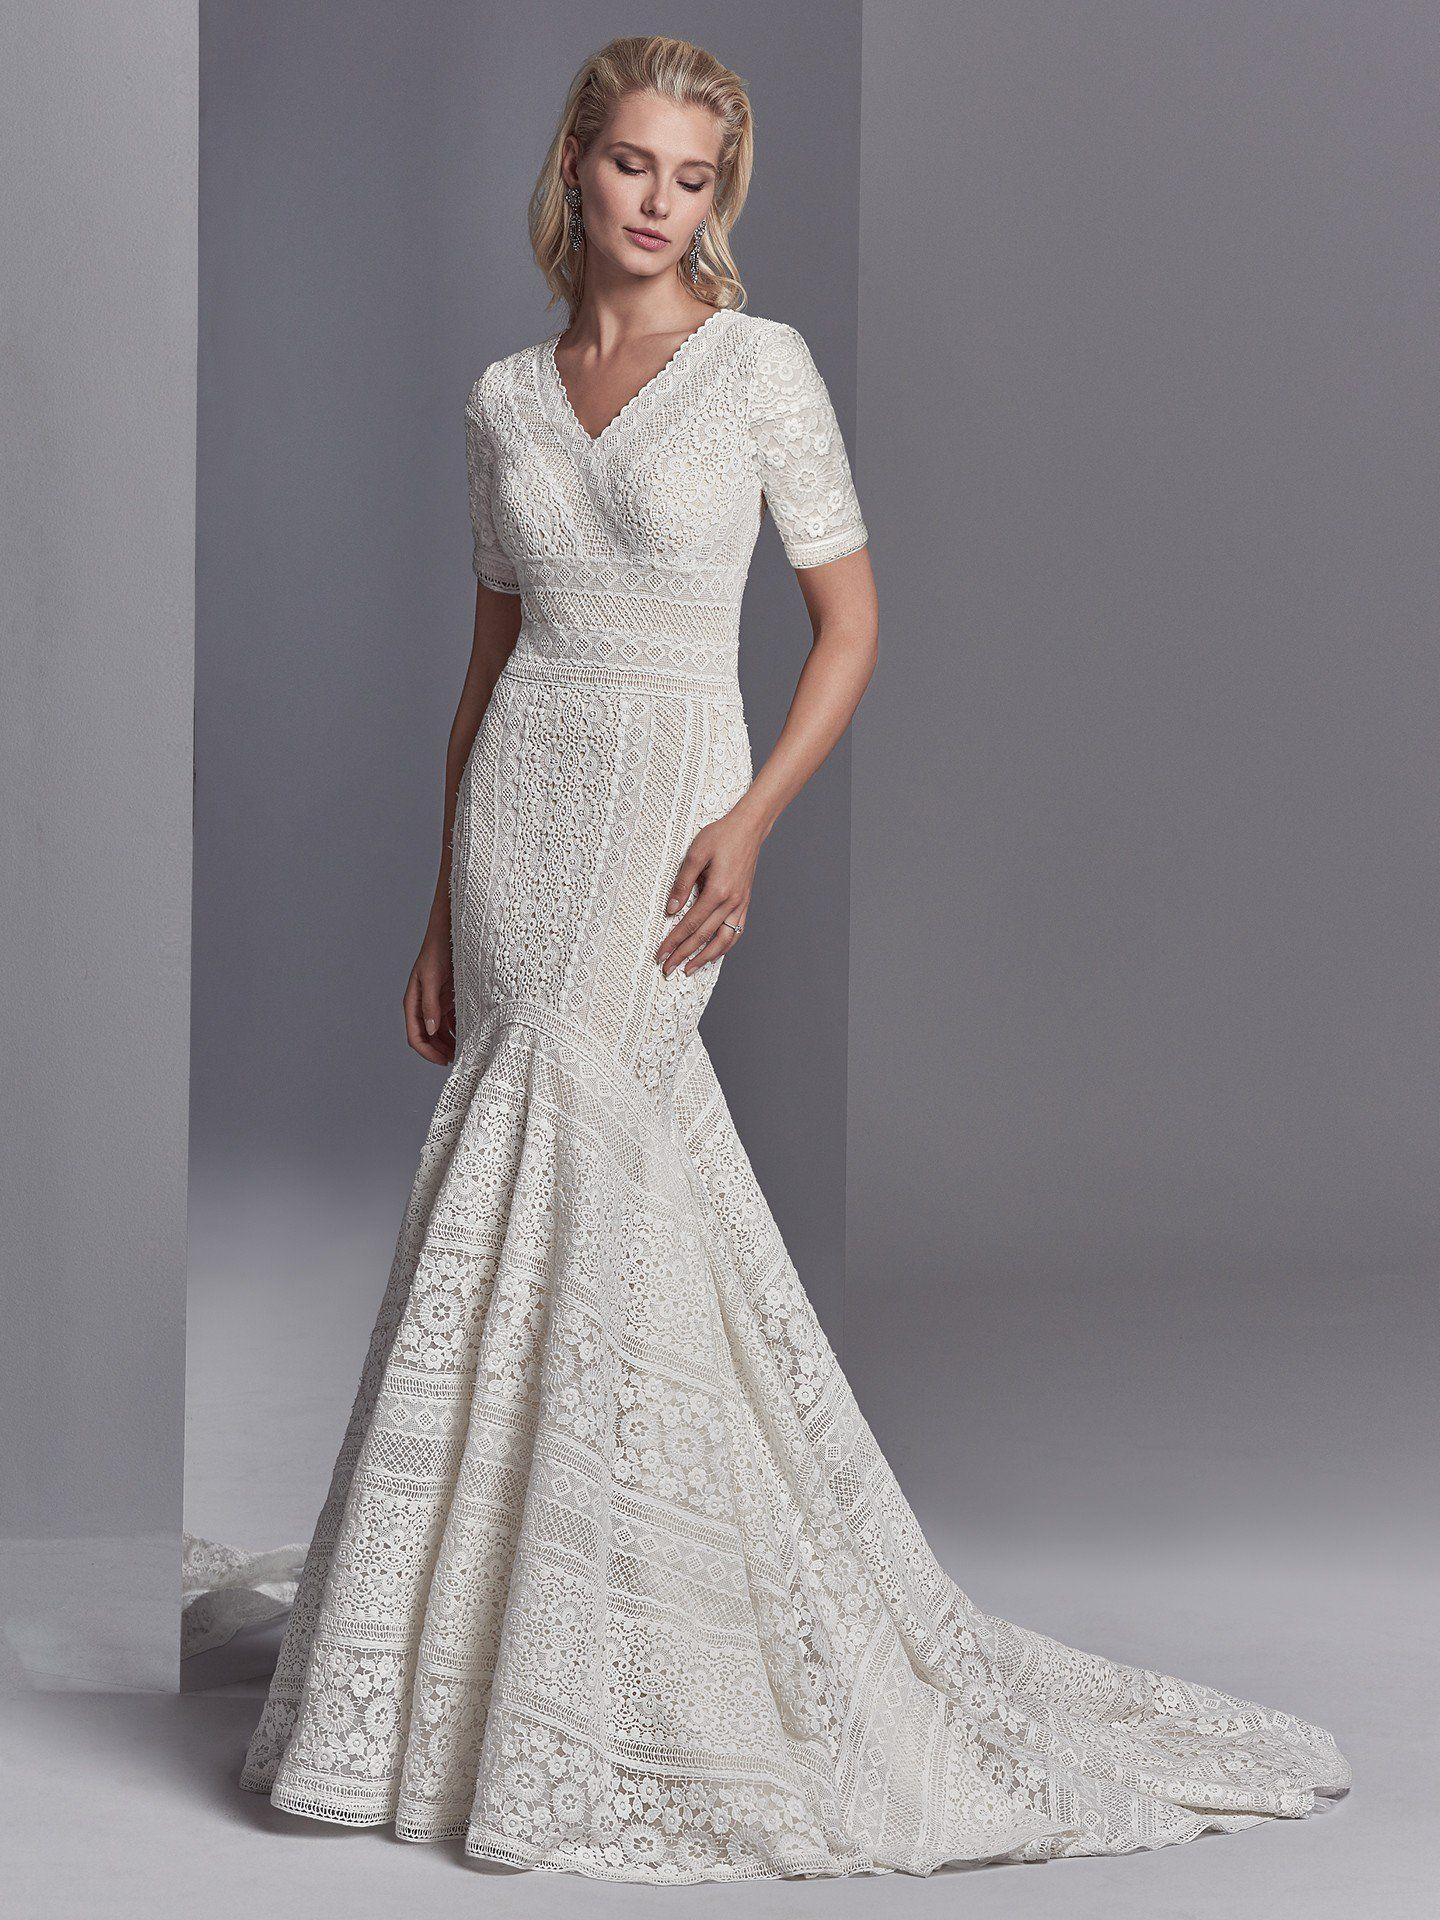 Eyelet wedding dress  Maggie Sottero Wedding Dresses  Maggie sottero Eyelet lace and